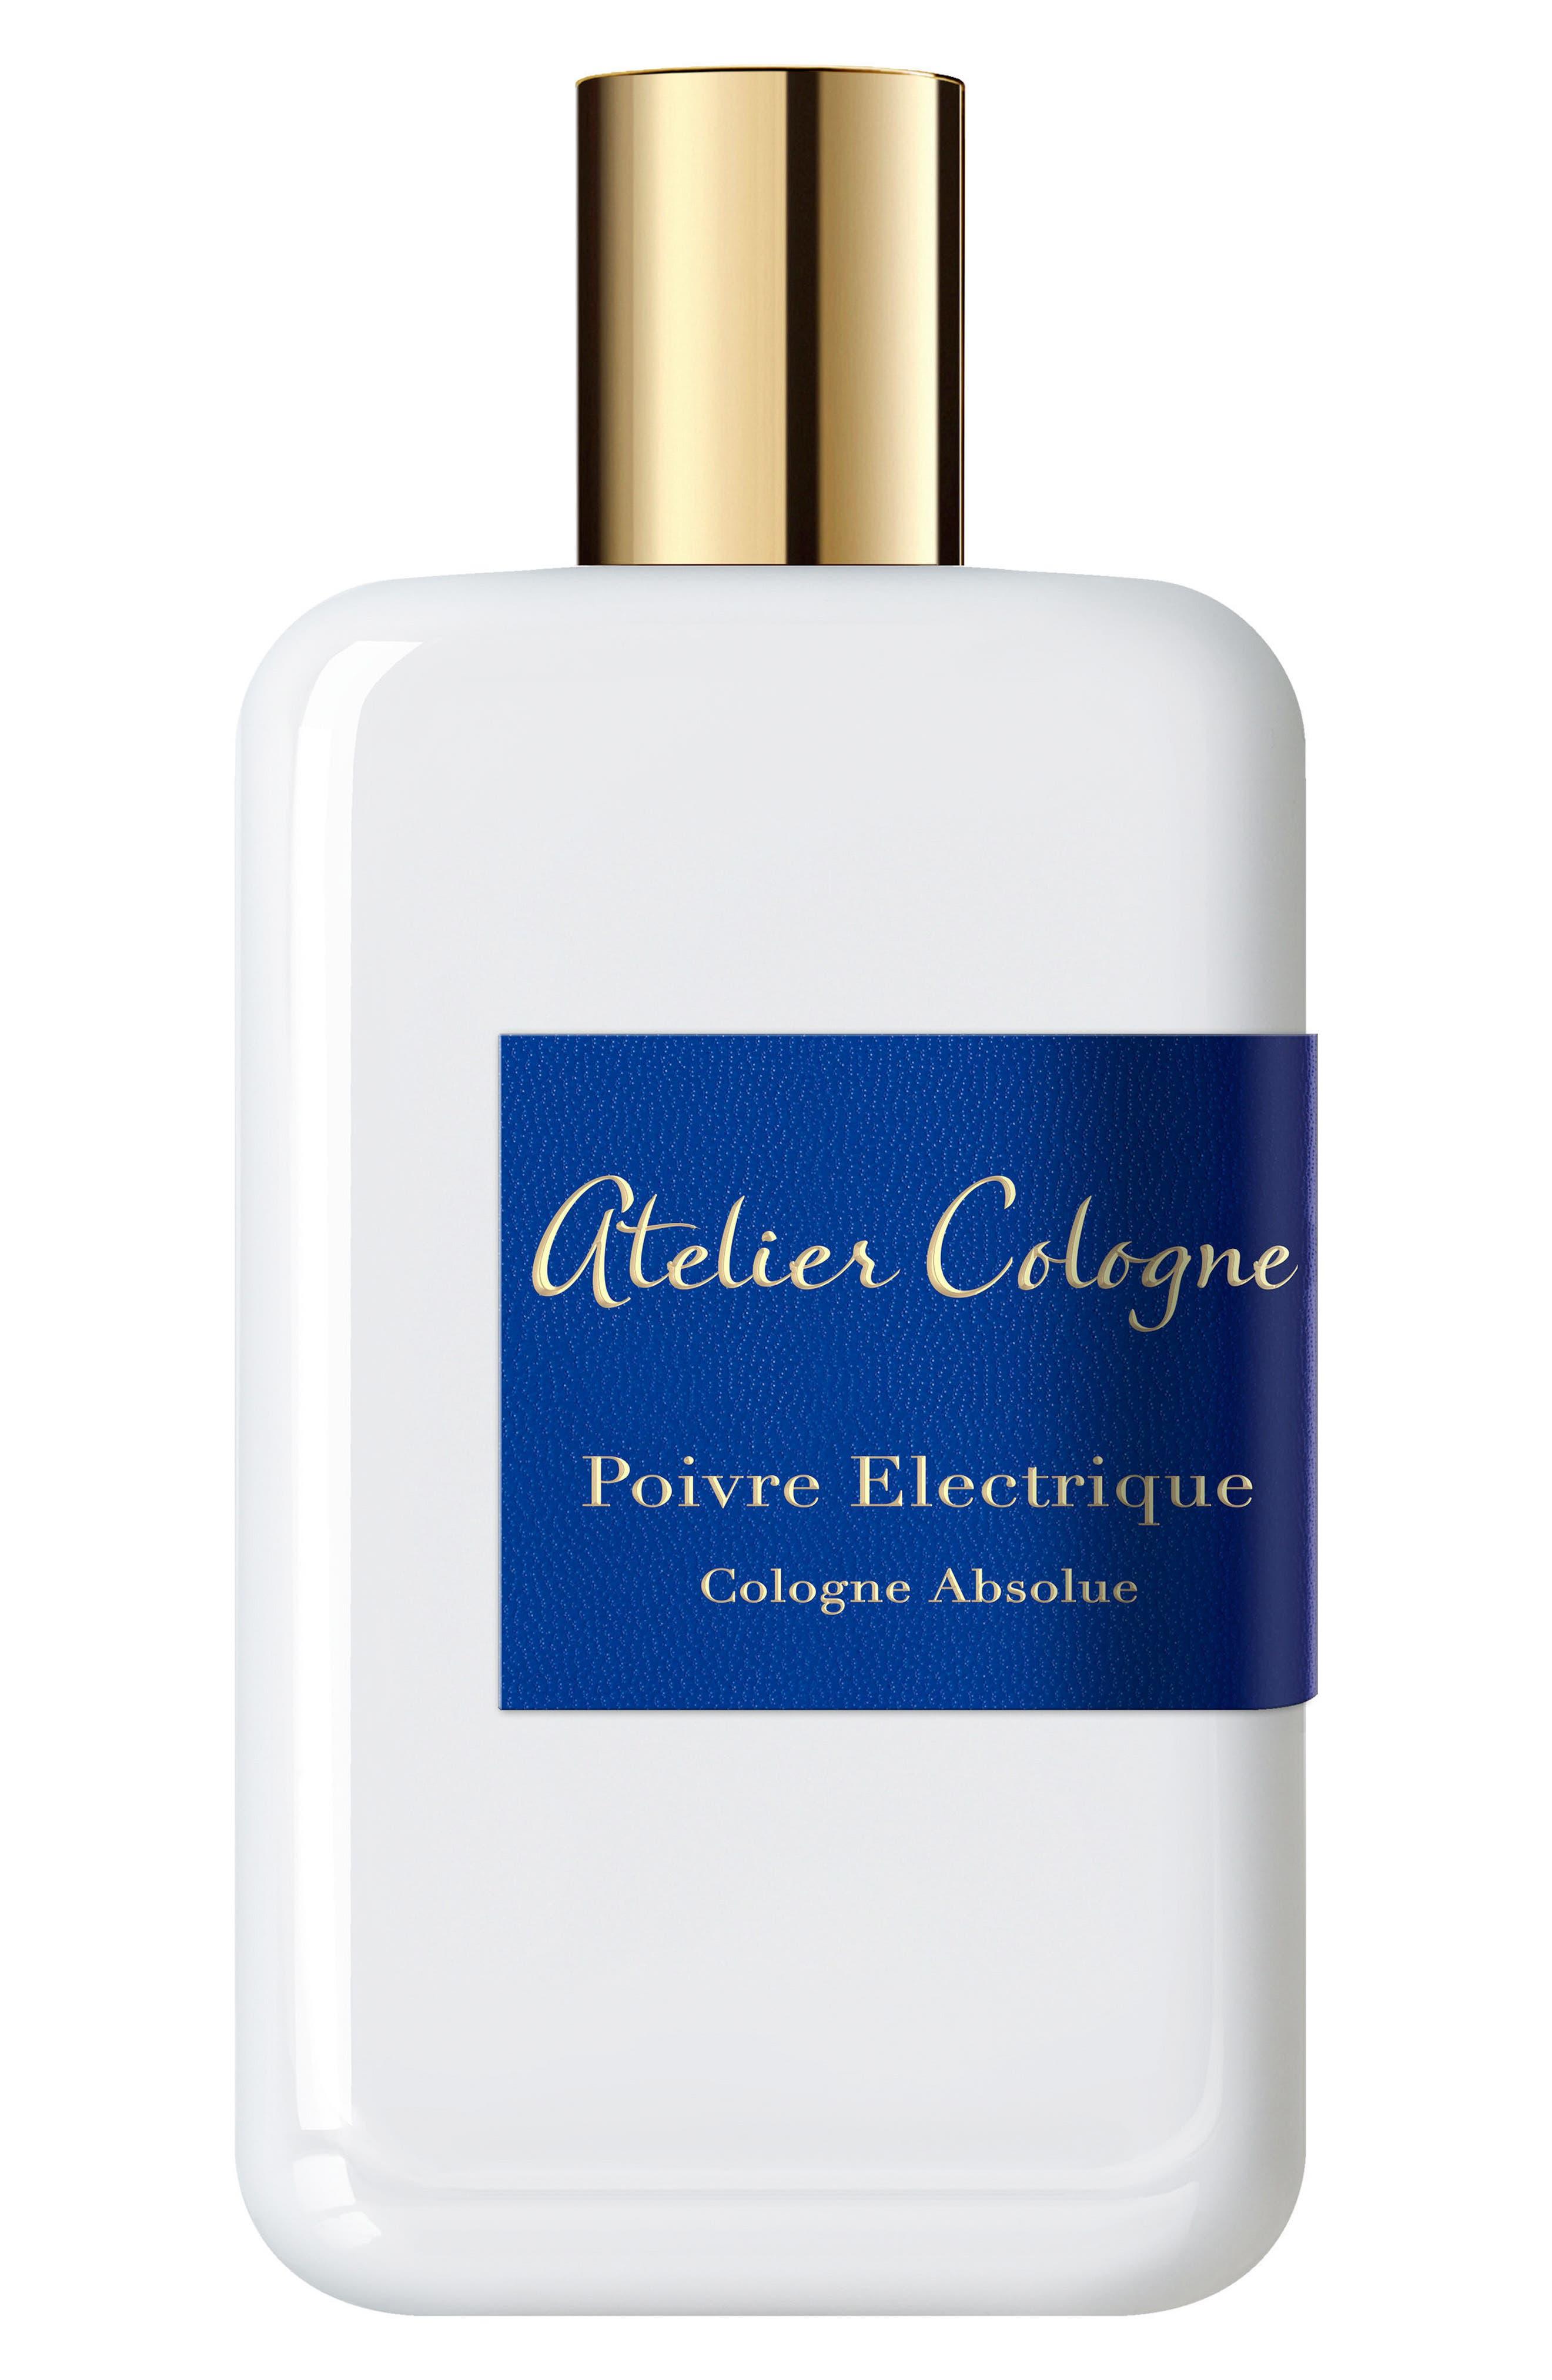 Alternate Image 1 Selected - Atelier Cologne Poivre Electrique Cologne Absolue